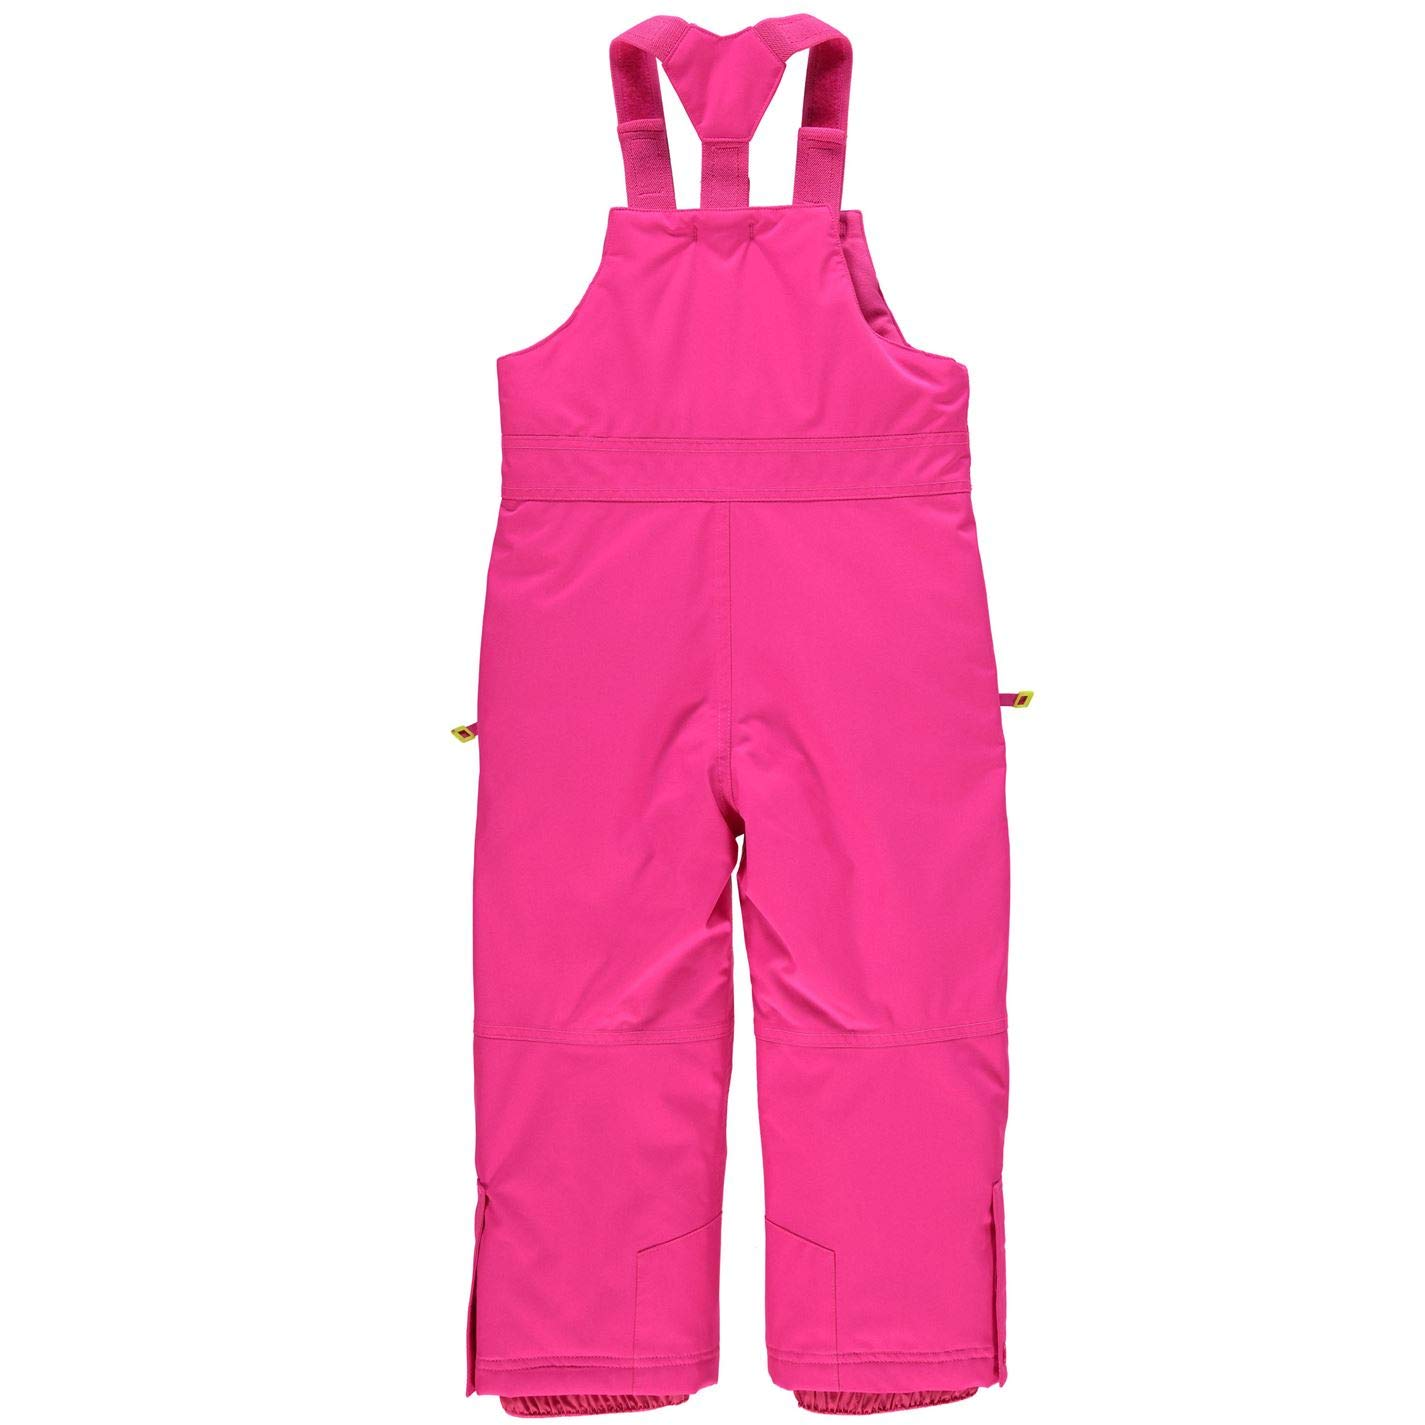 6f0ca49e141b Nevica Kids Meribel Ski Pants Infants  Amazon.co.uk  Clothing